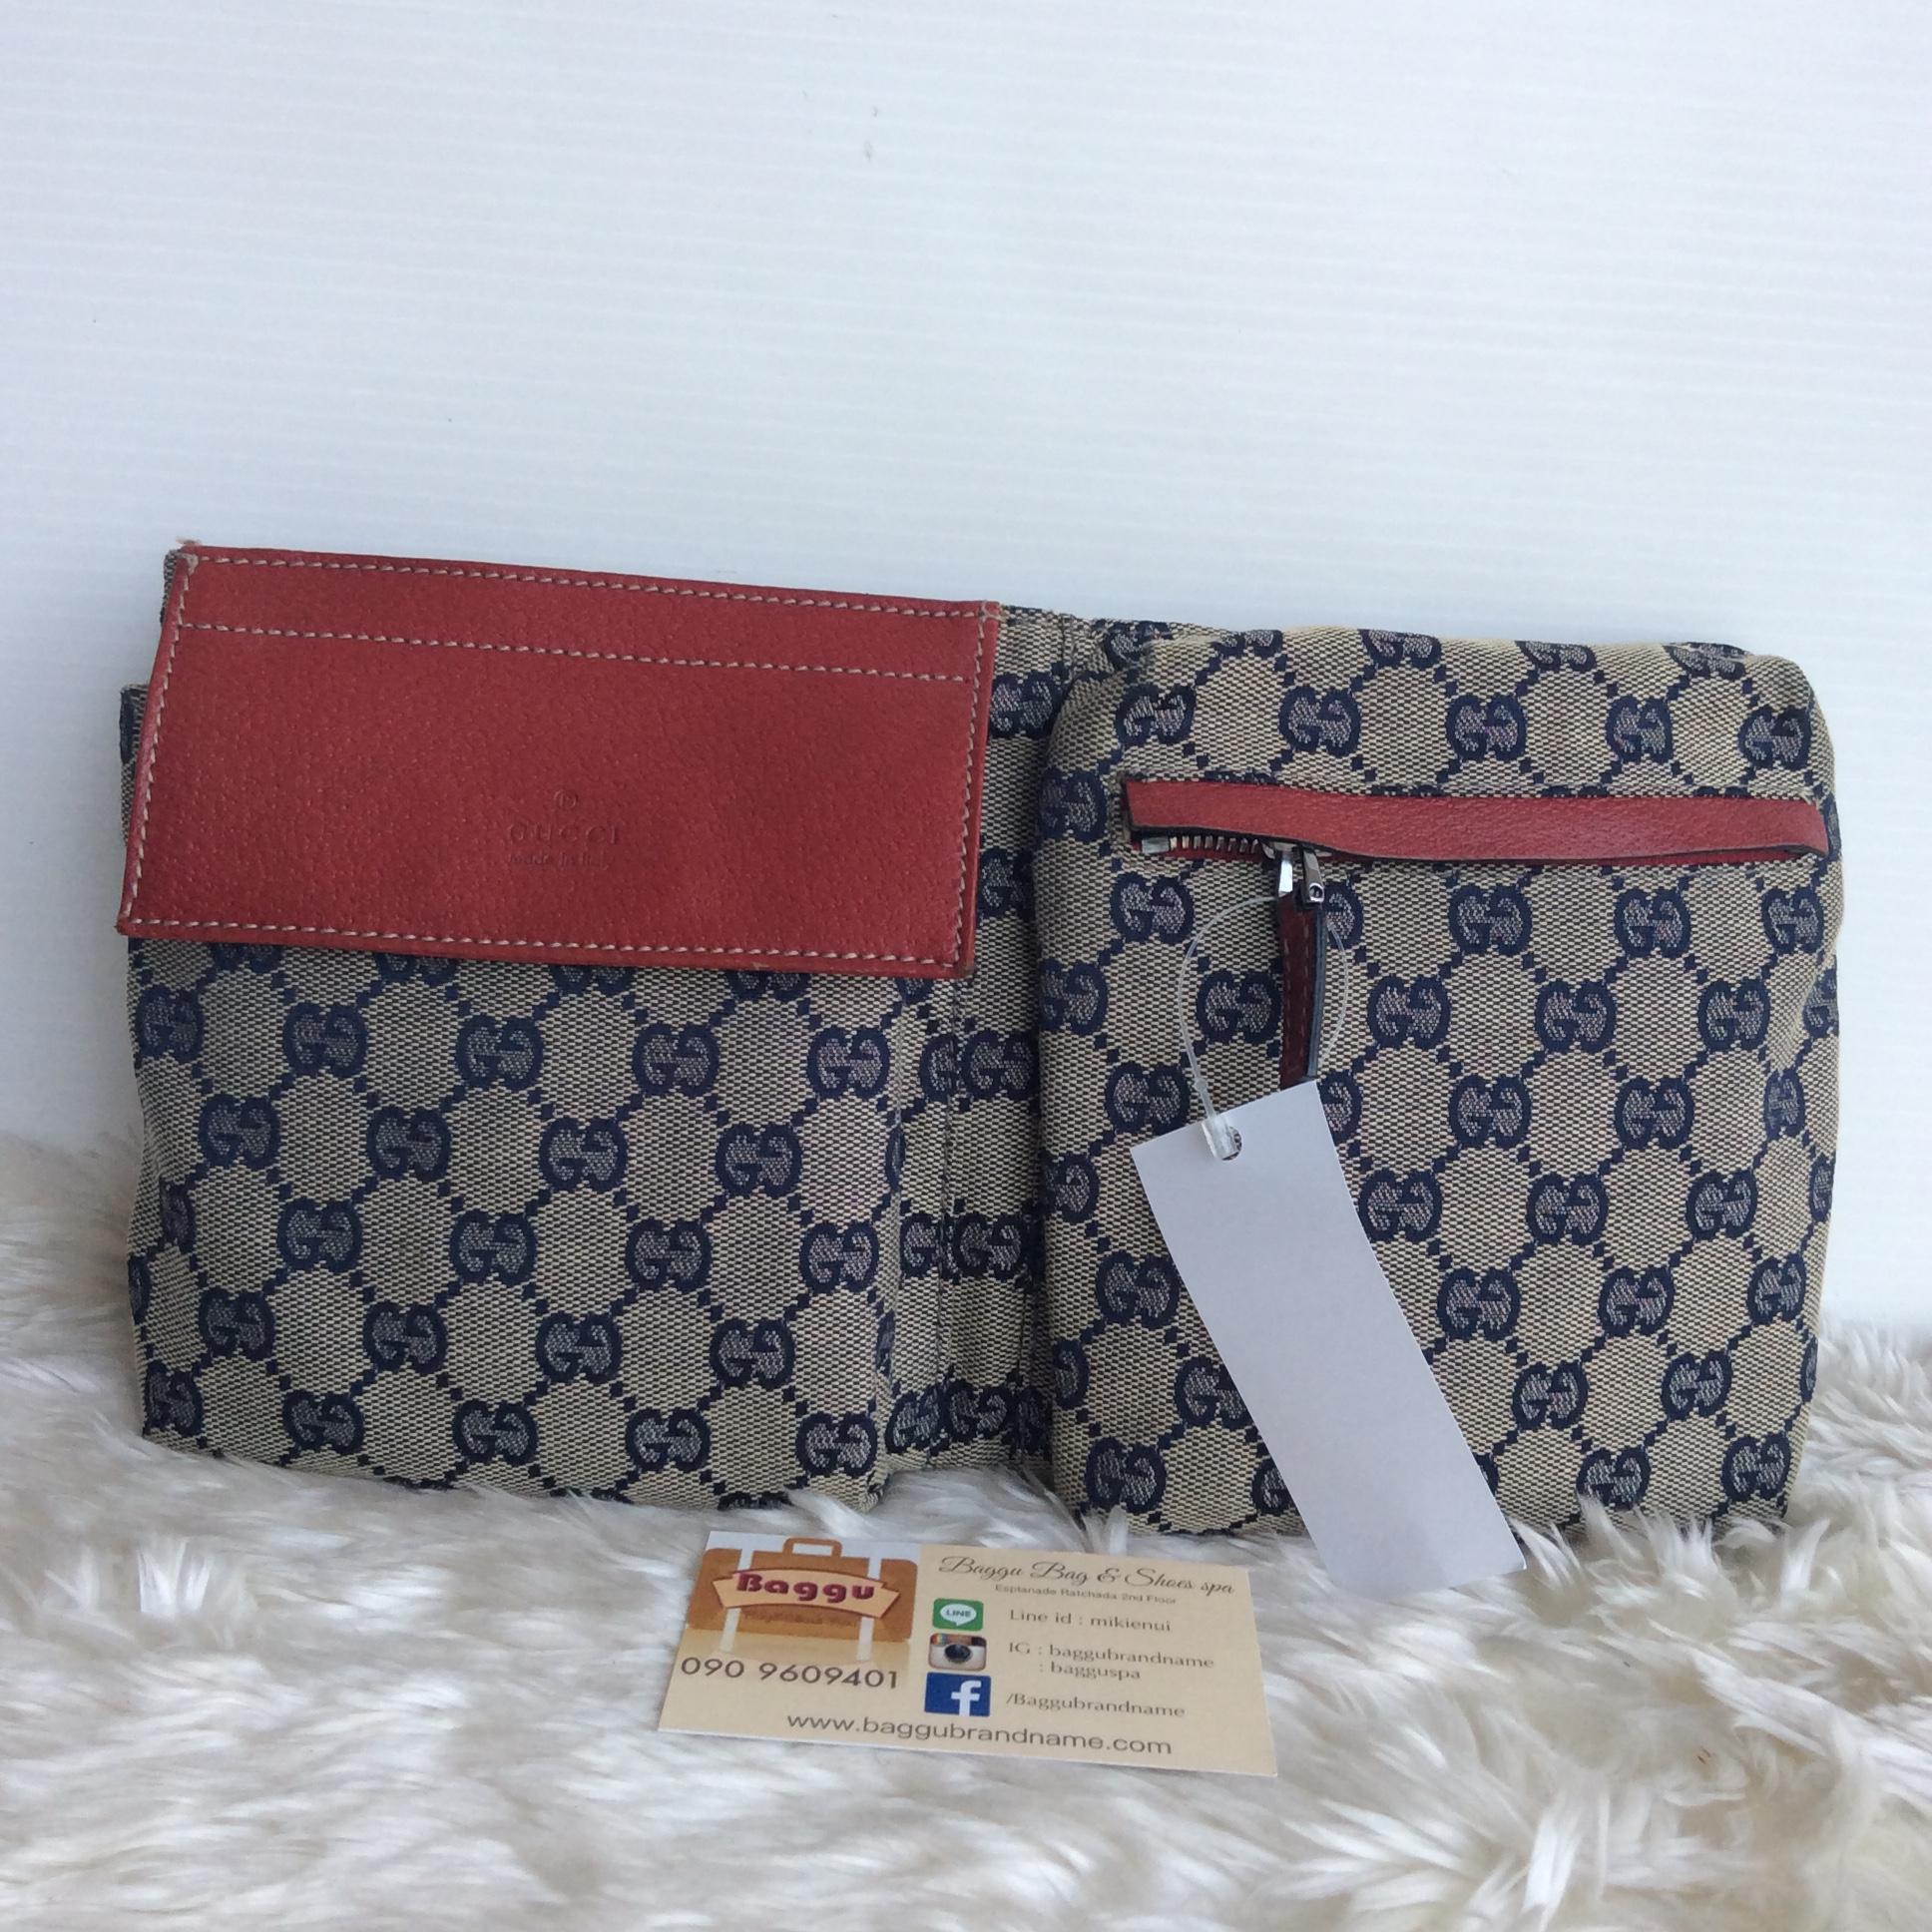 (SOLDOUT)Gucci Belt Bag Red